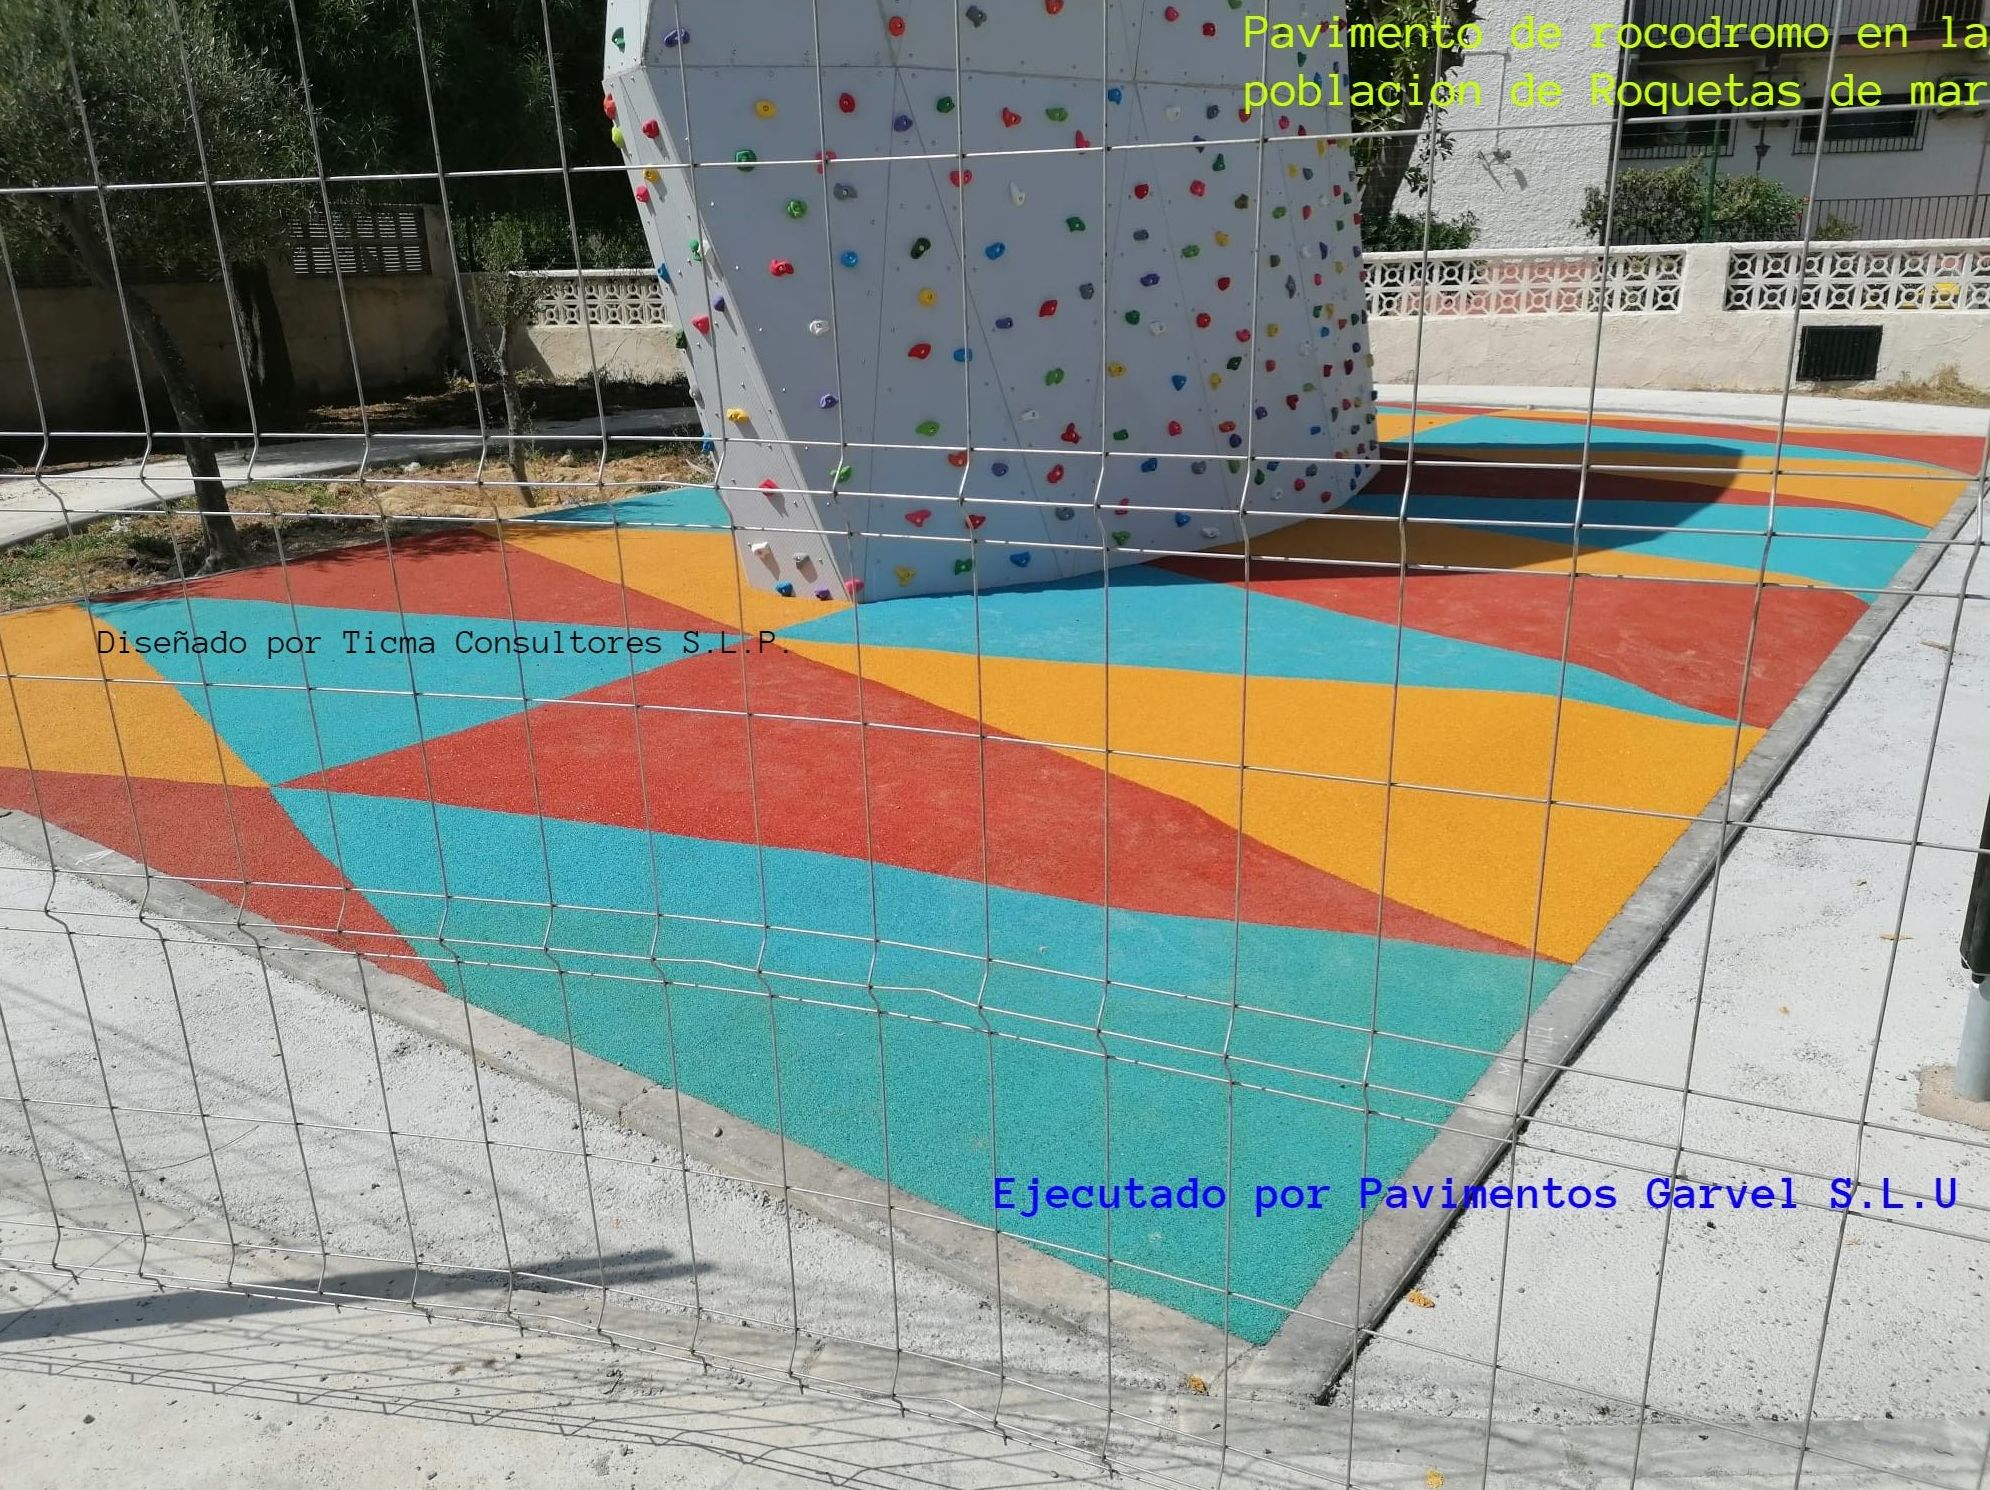 Foto 8 de Instalación de pavimentos de caucho para parques infantiles en Las Cabezas de San Juan   Pavimentos Garvel